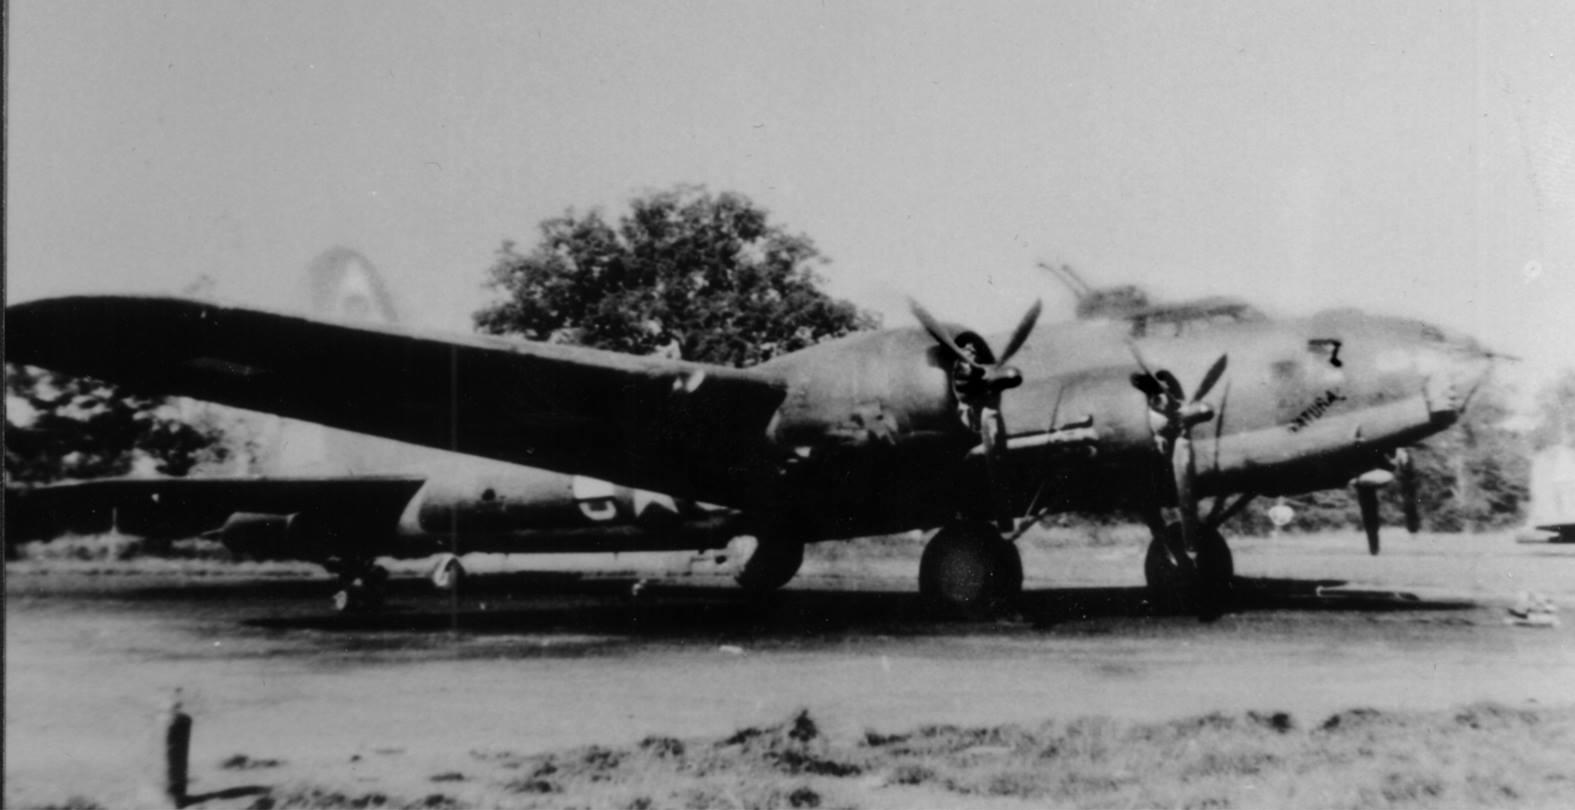 B-17 #42-5852 / The Natural